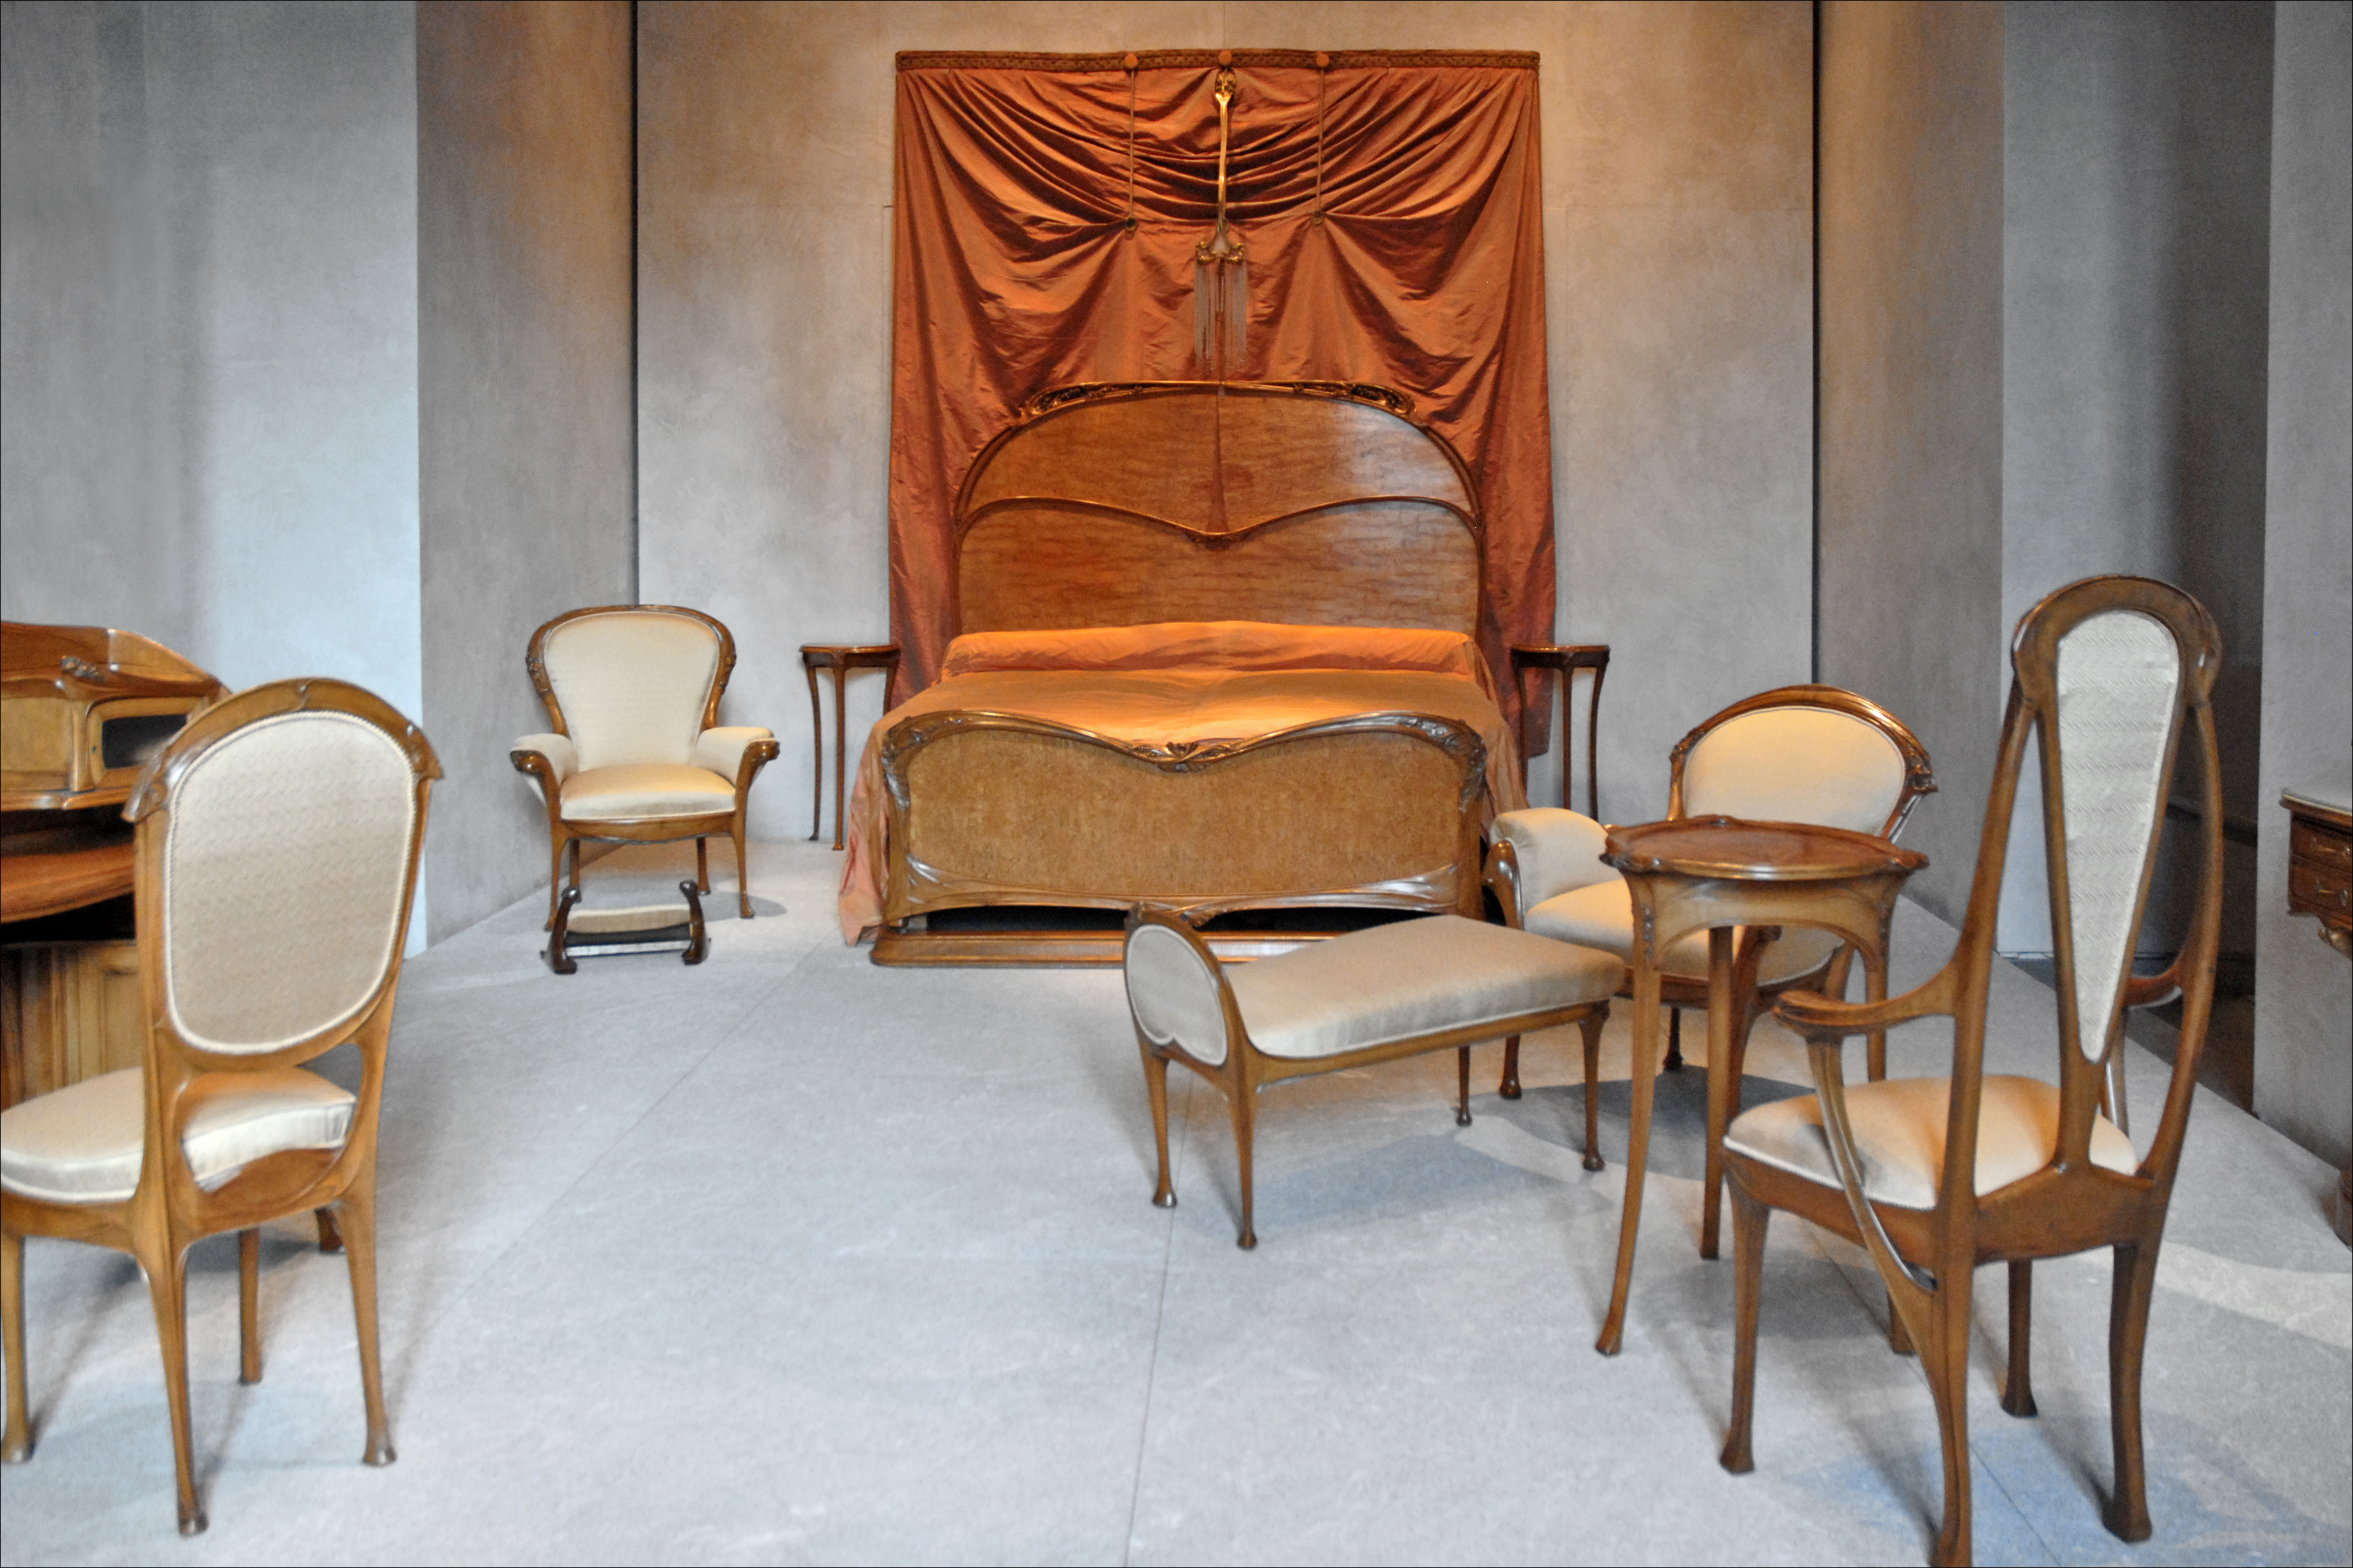 file hector guimard mus e des beaux arts de lyon 5469500132 jpg wikimedia commons. Black Bedroom Furniture Sets. Home Design Ideas